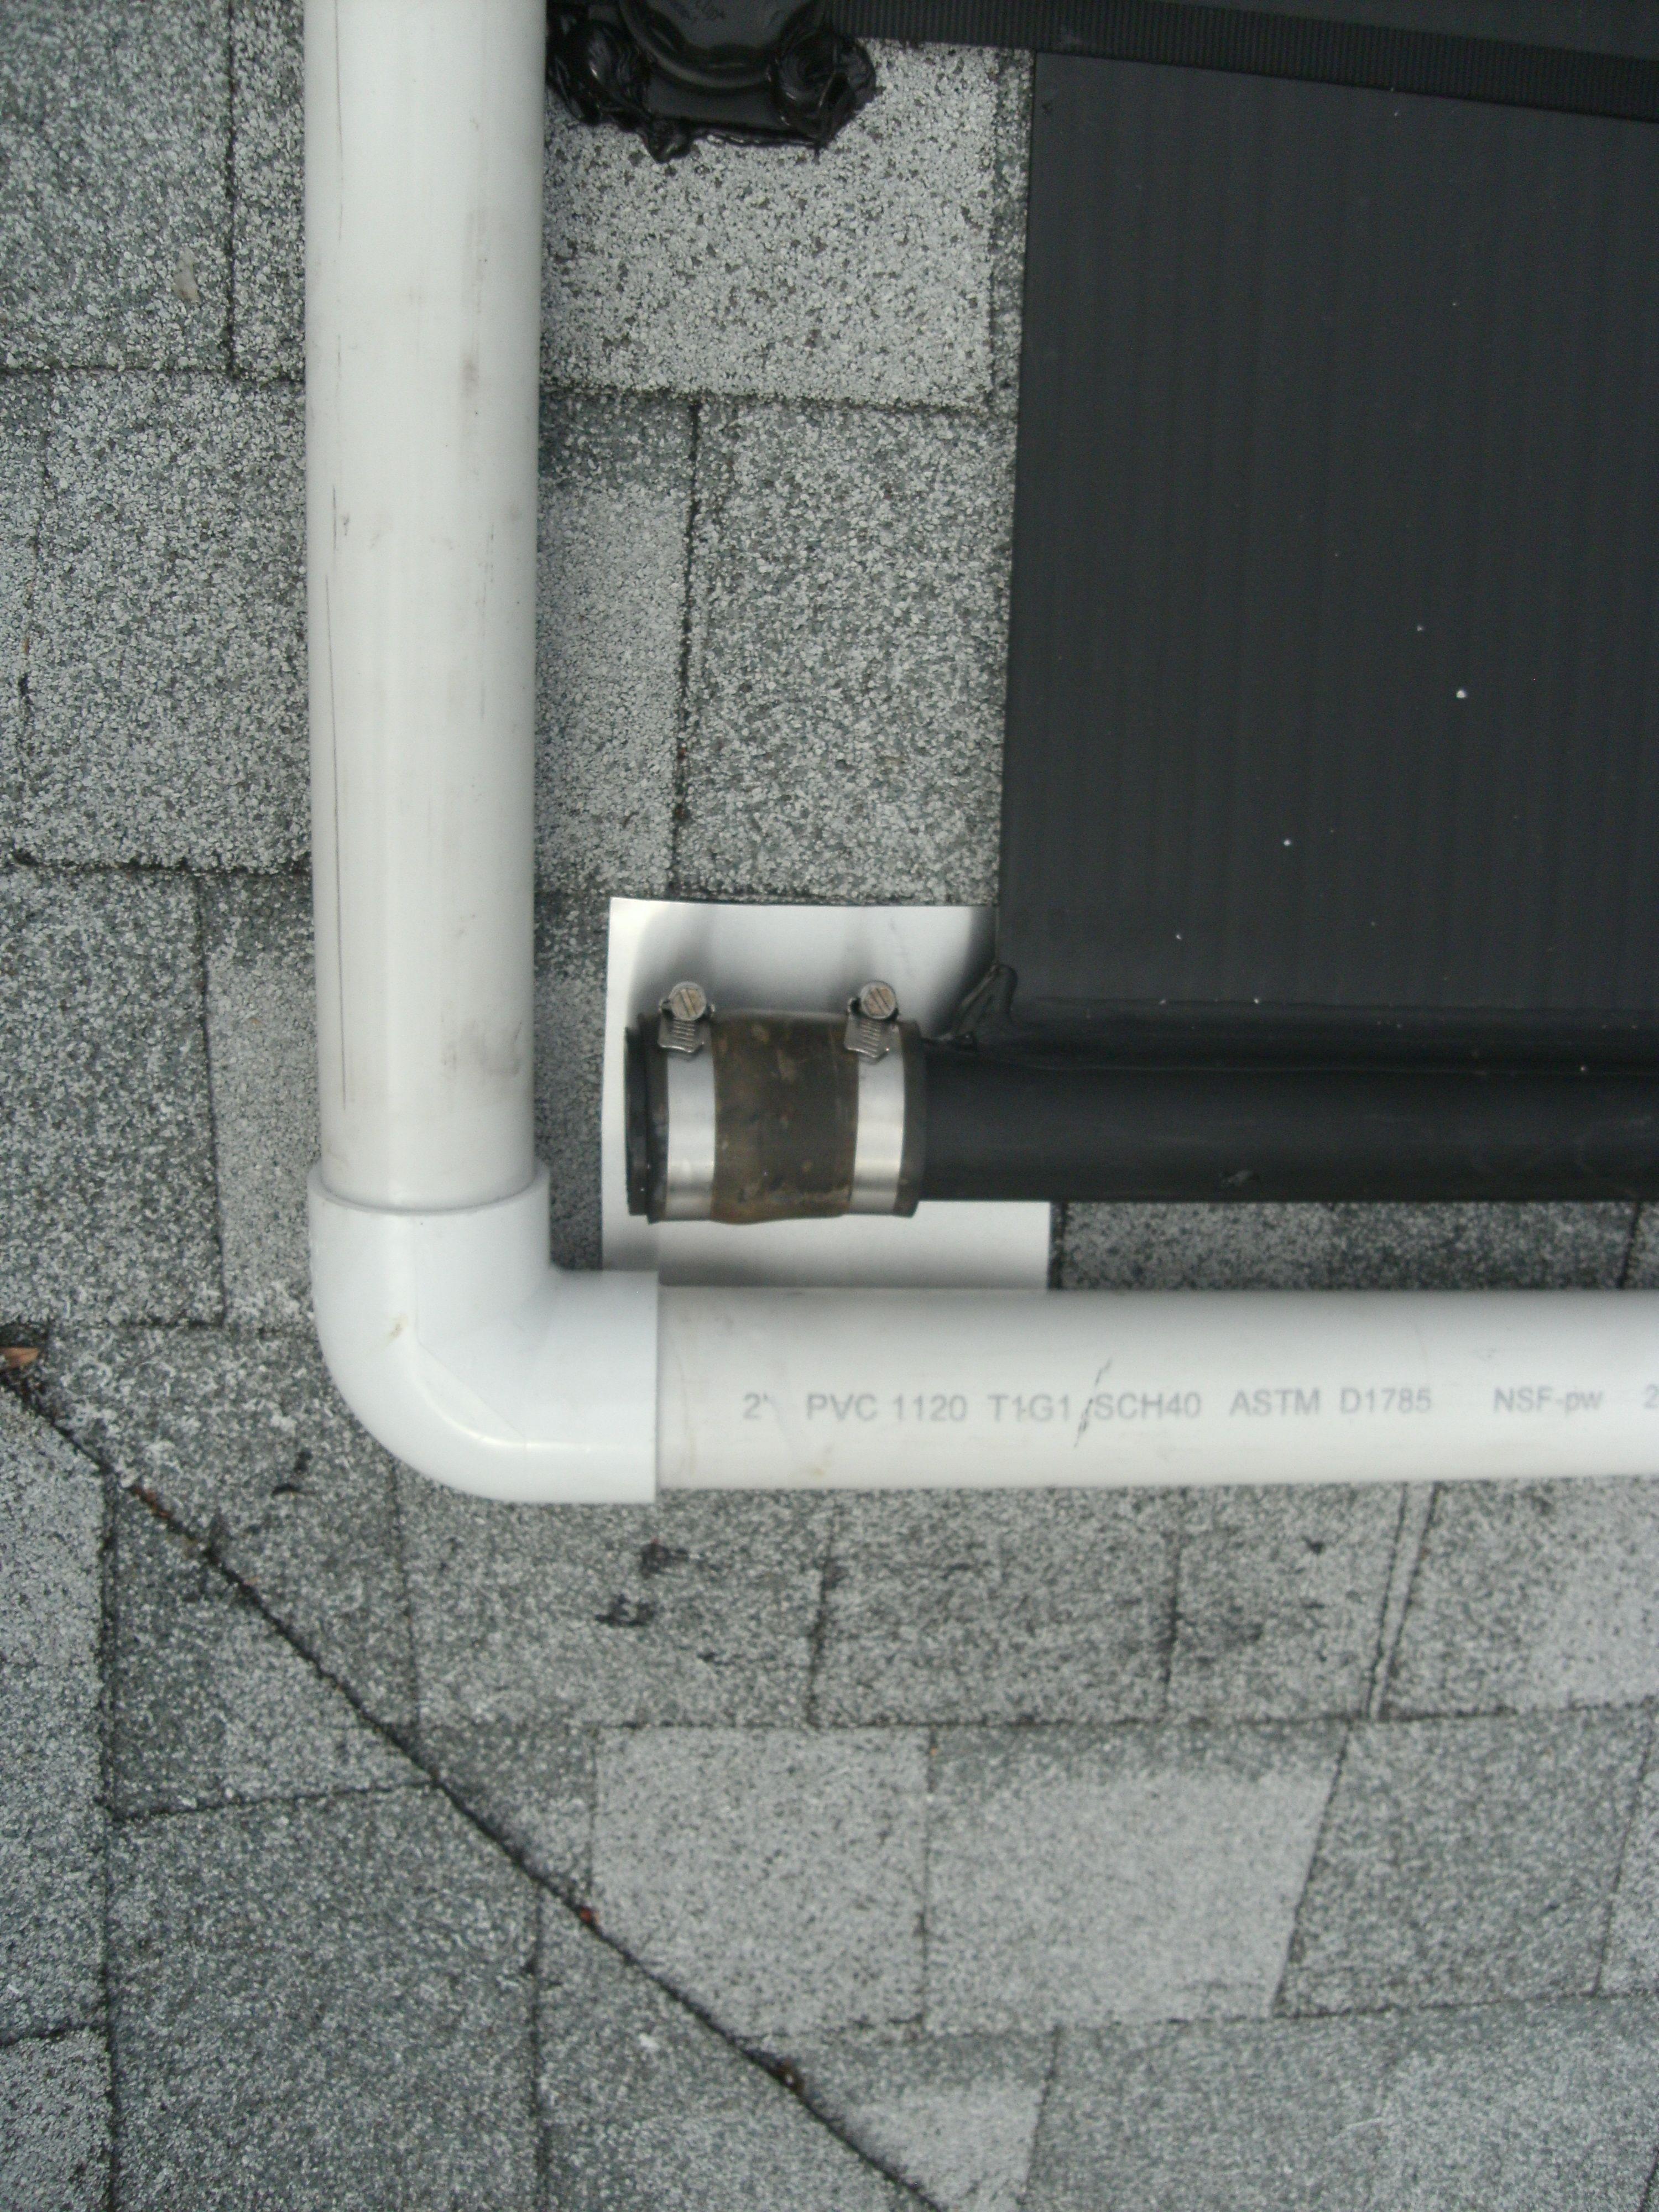 Vortex Solar Pool Heater Www Diysolarpoolheaterkits Com Solar Pool Heating Pool Heater Solar Pool Heater